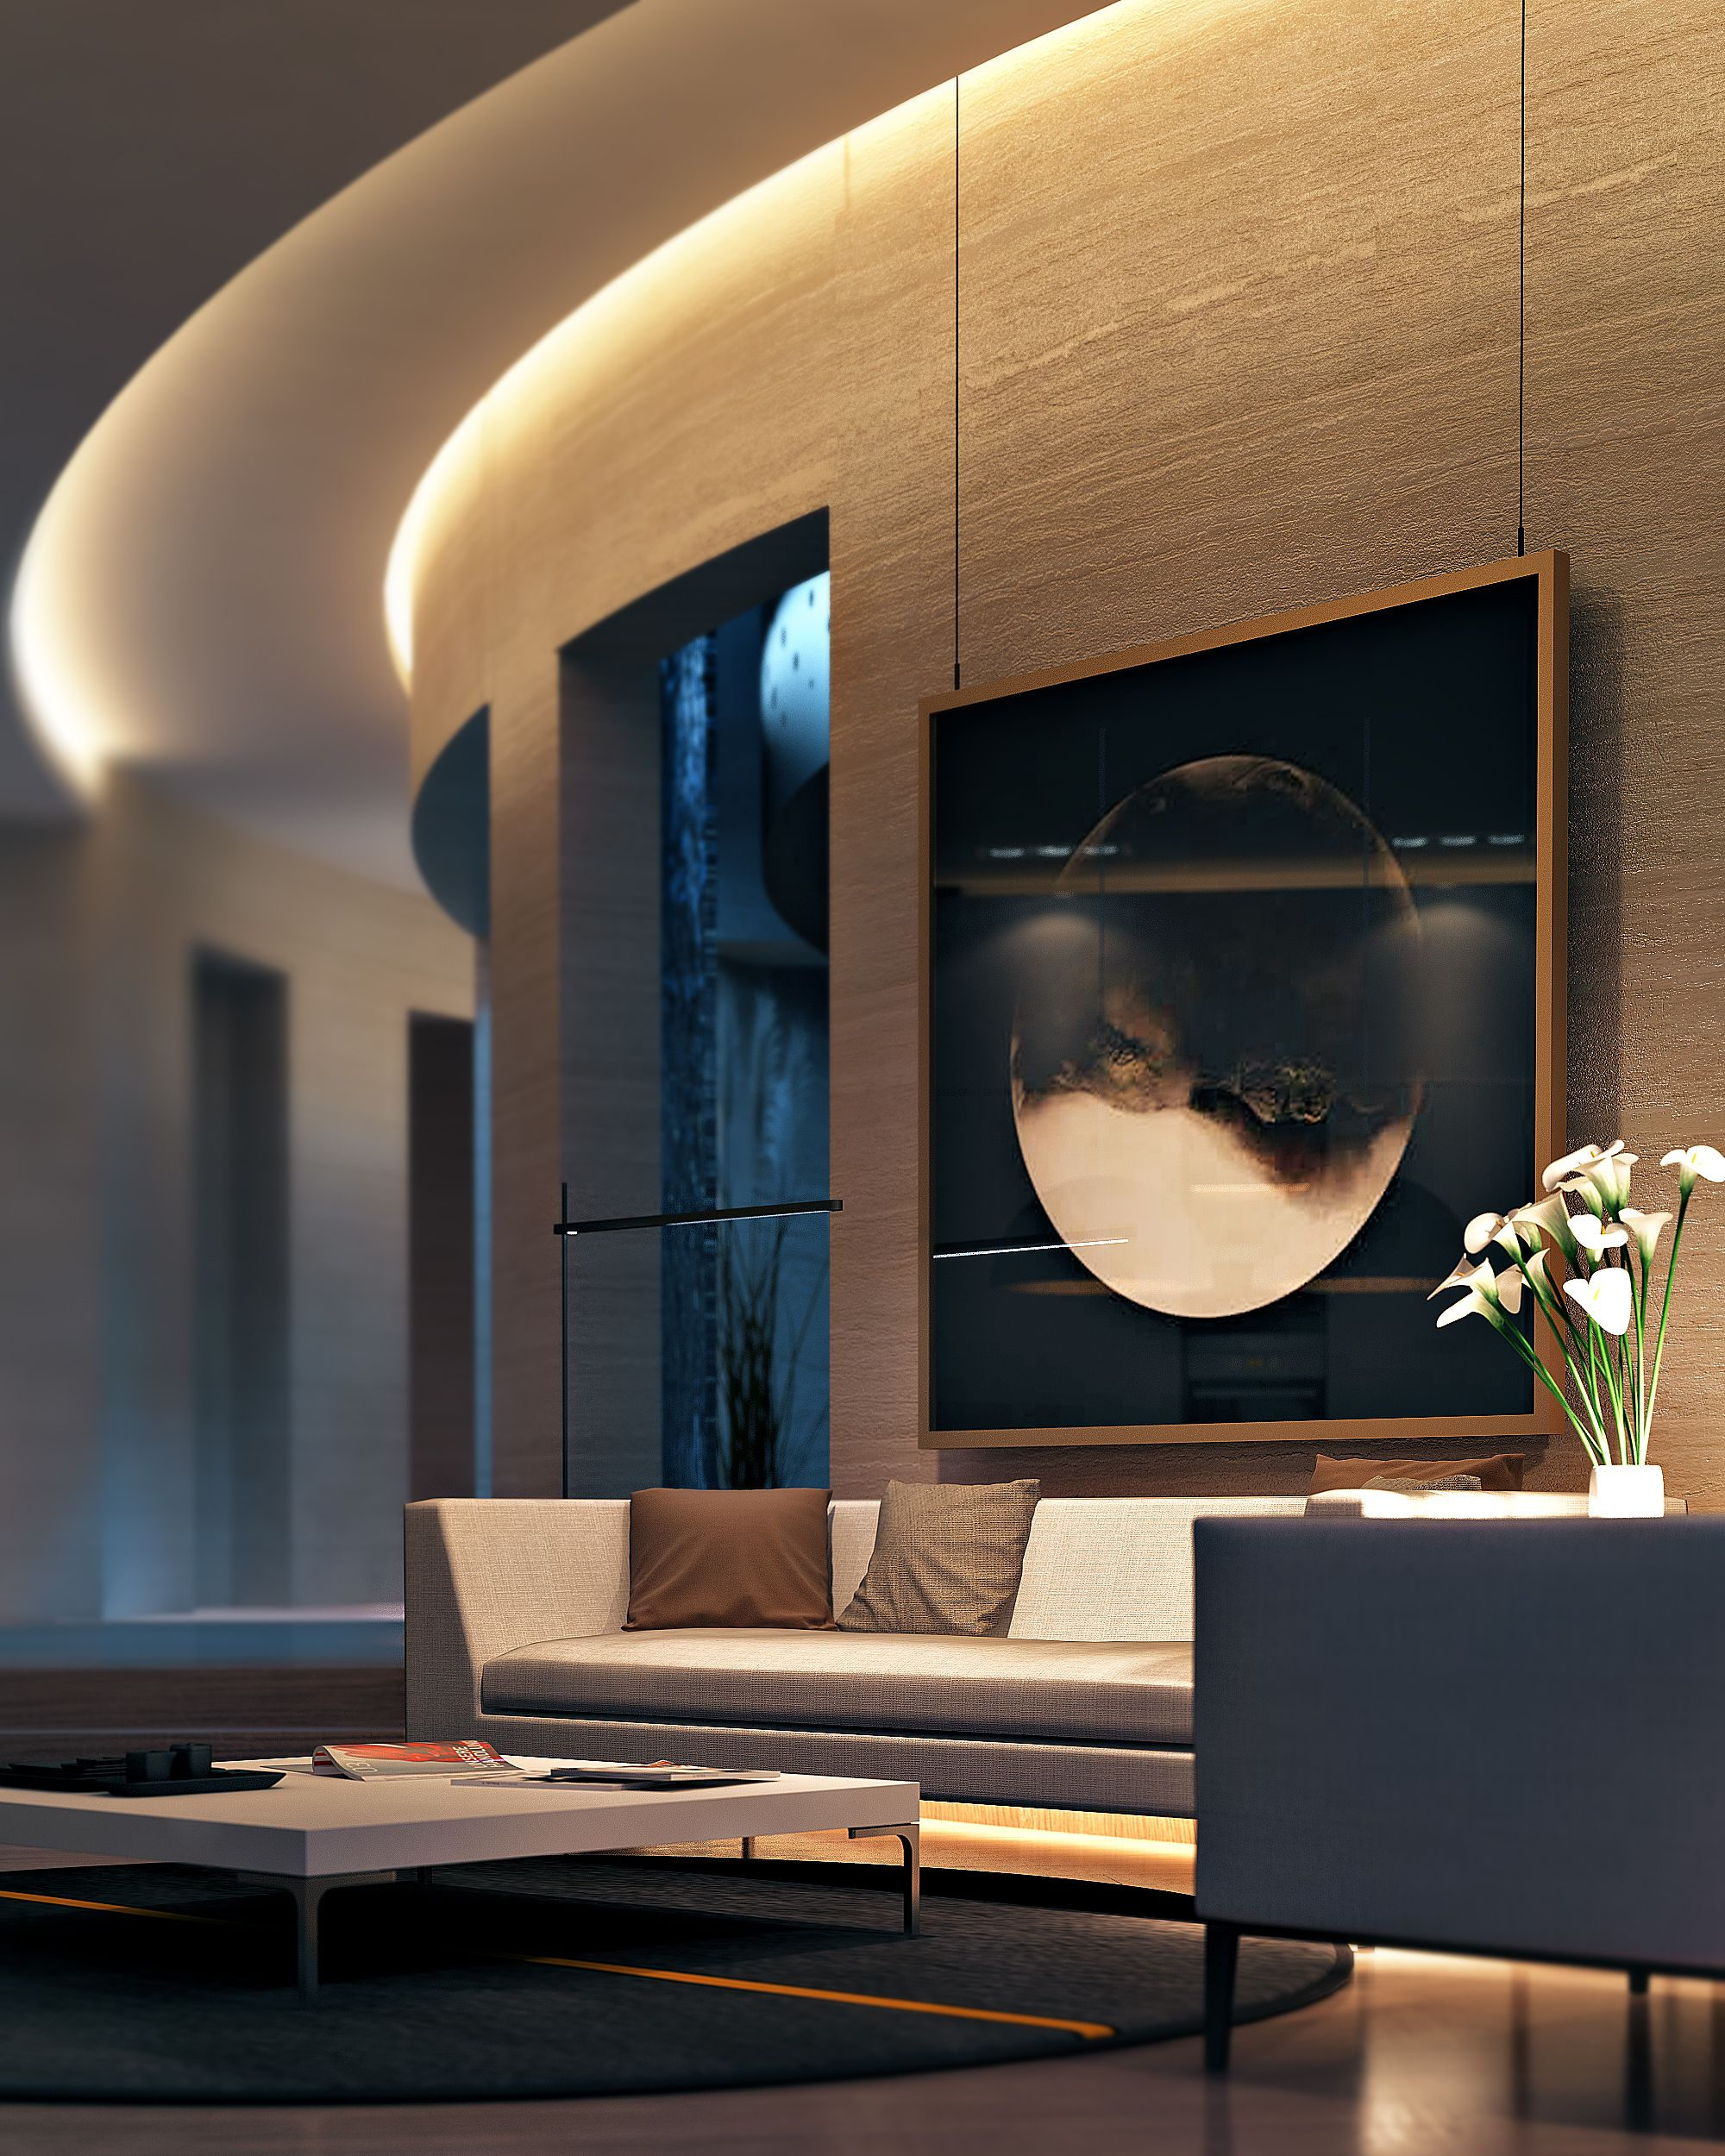 1052 Best Interior Design Images On Pinterest: Travertino Mimar Interiors (https://www.pinterest.com